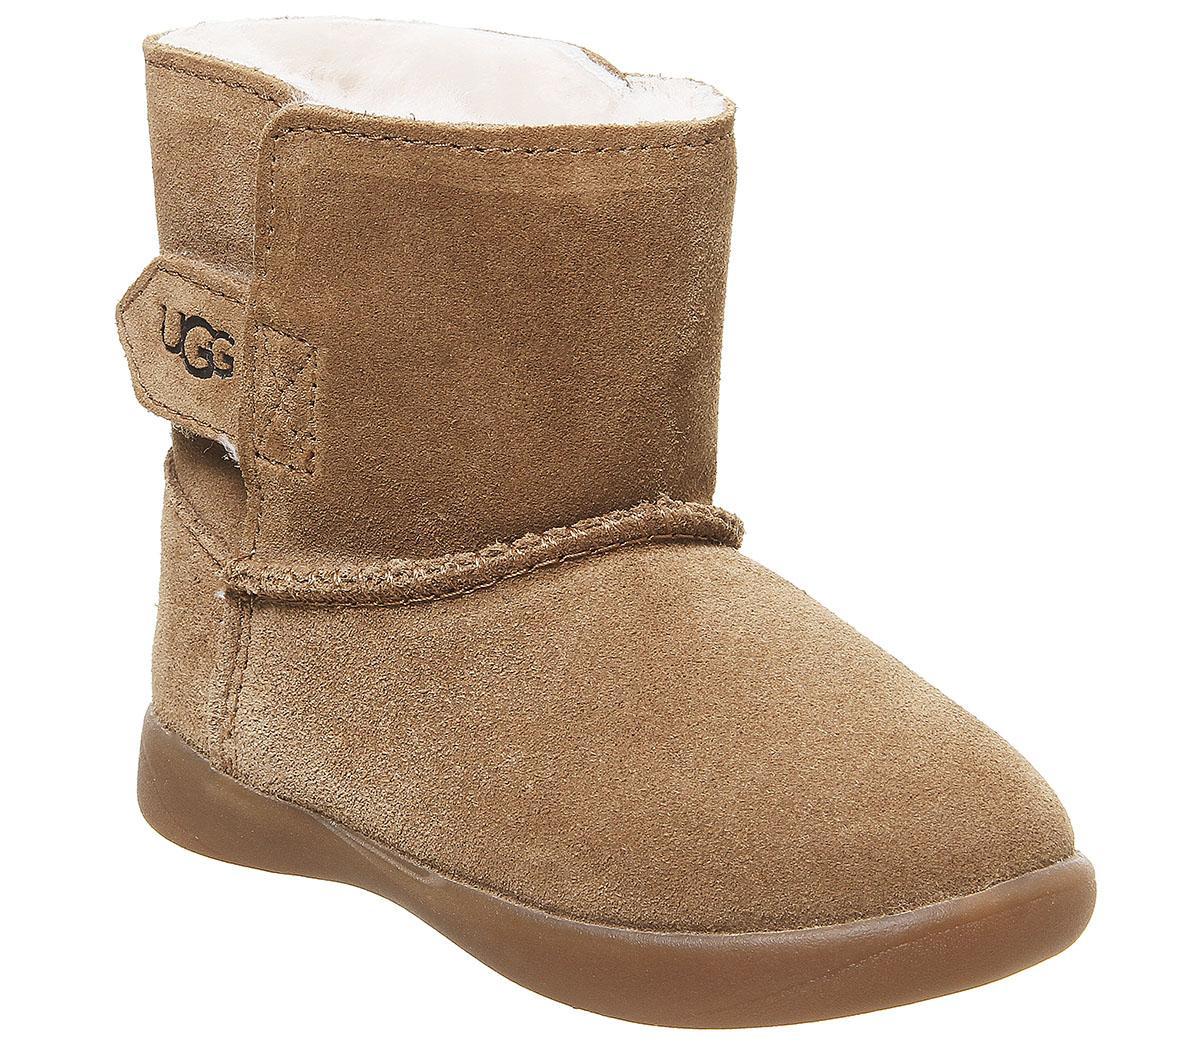 Keelan Infant Boots